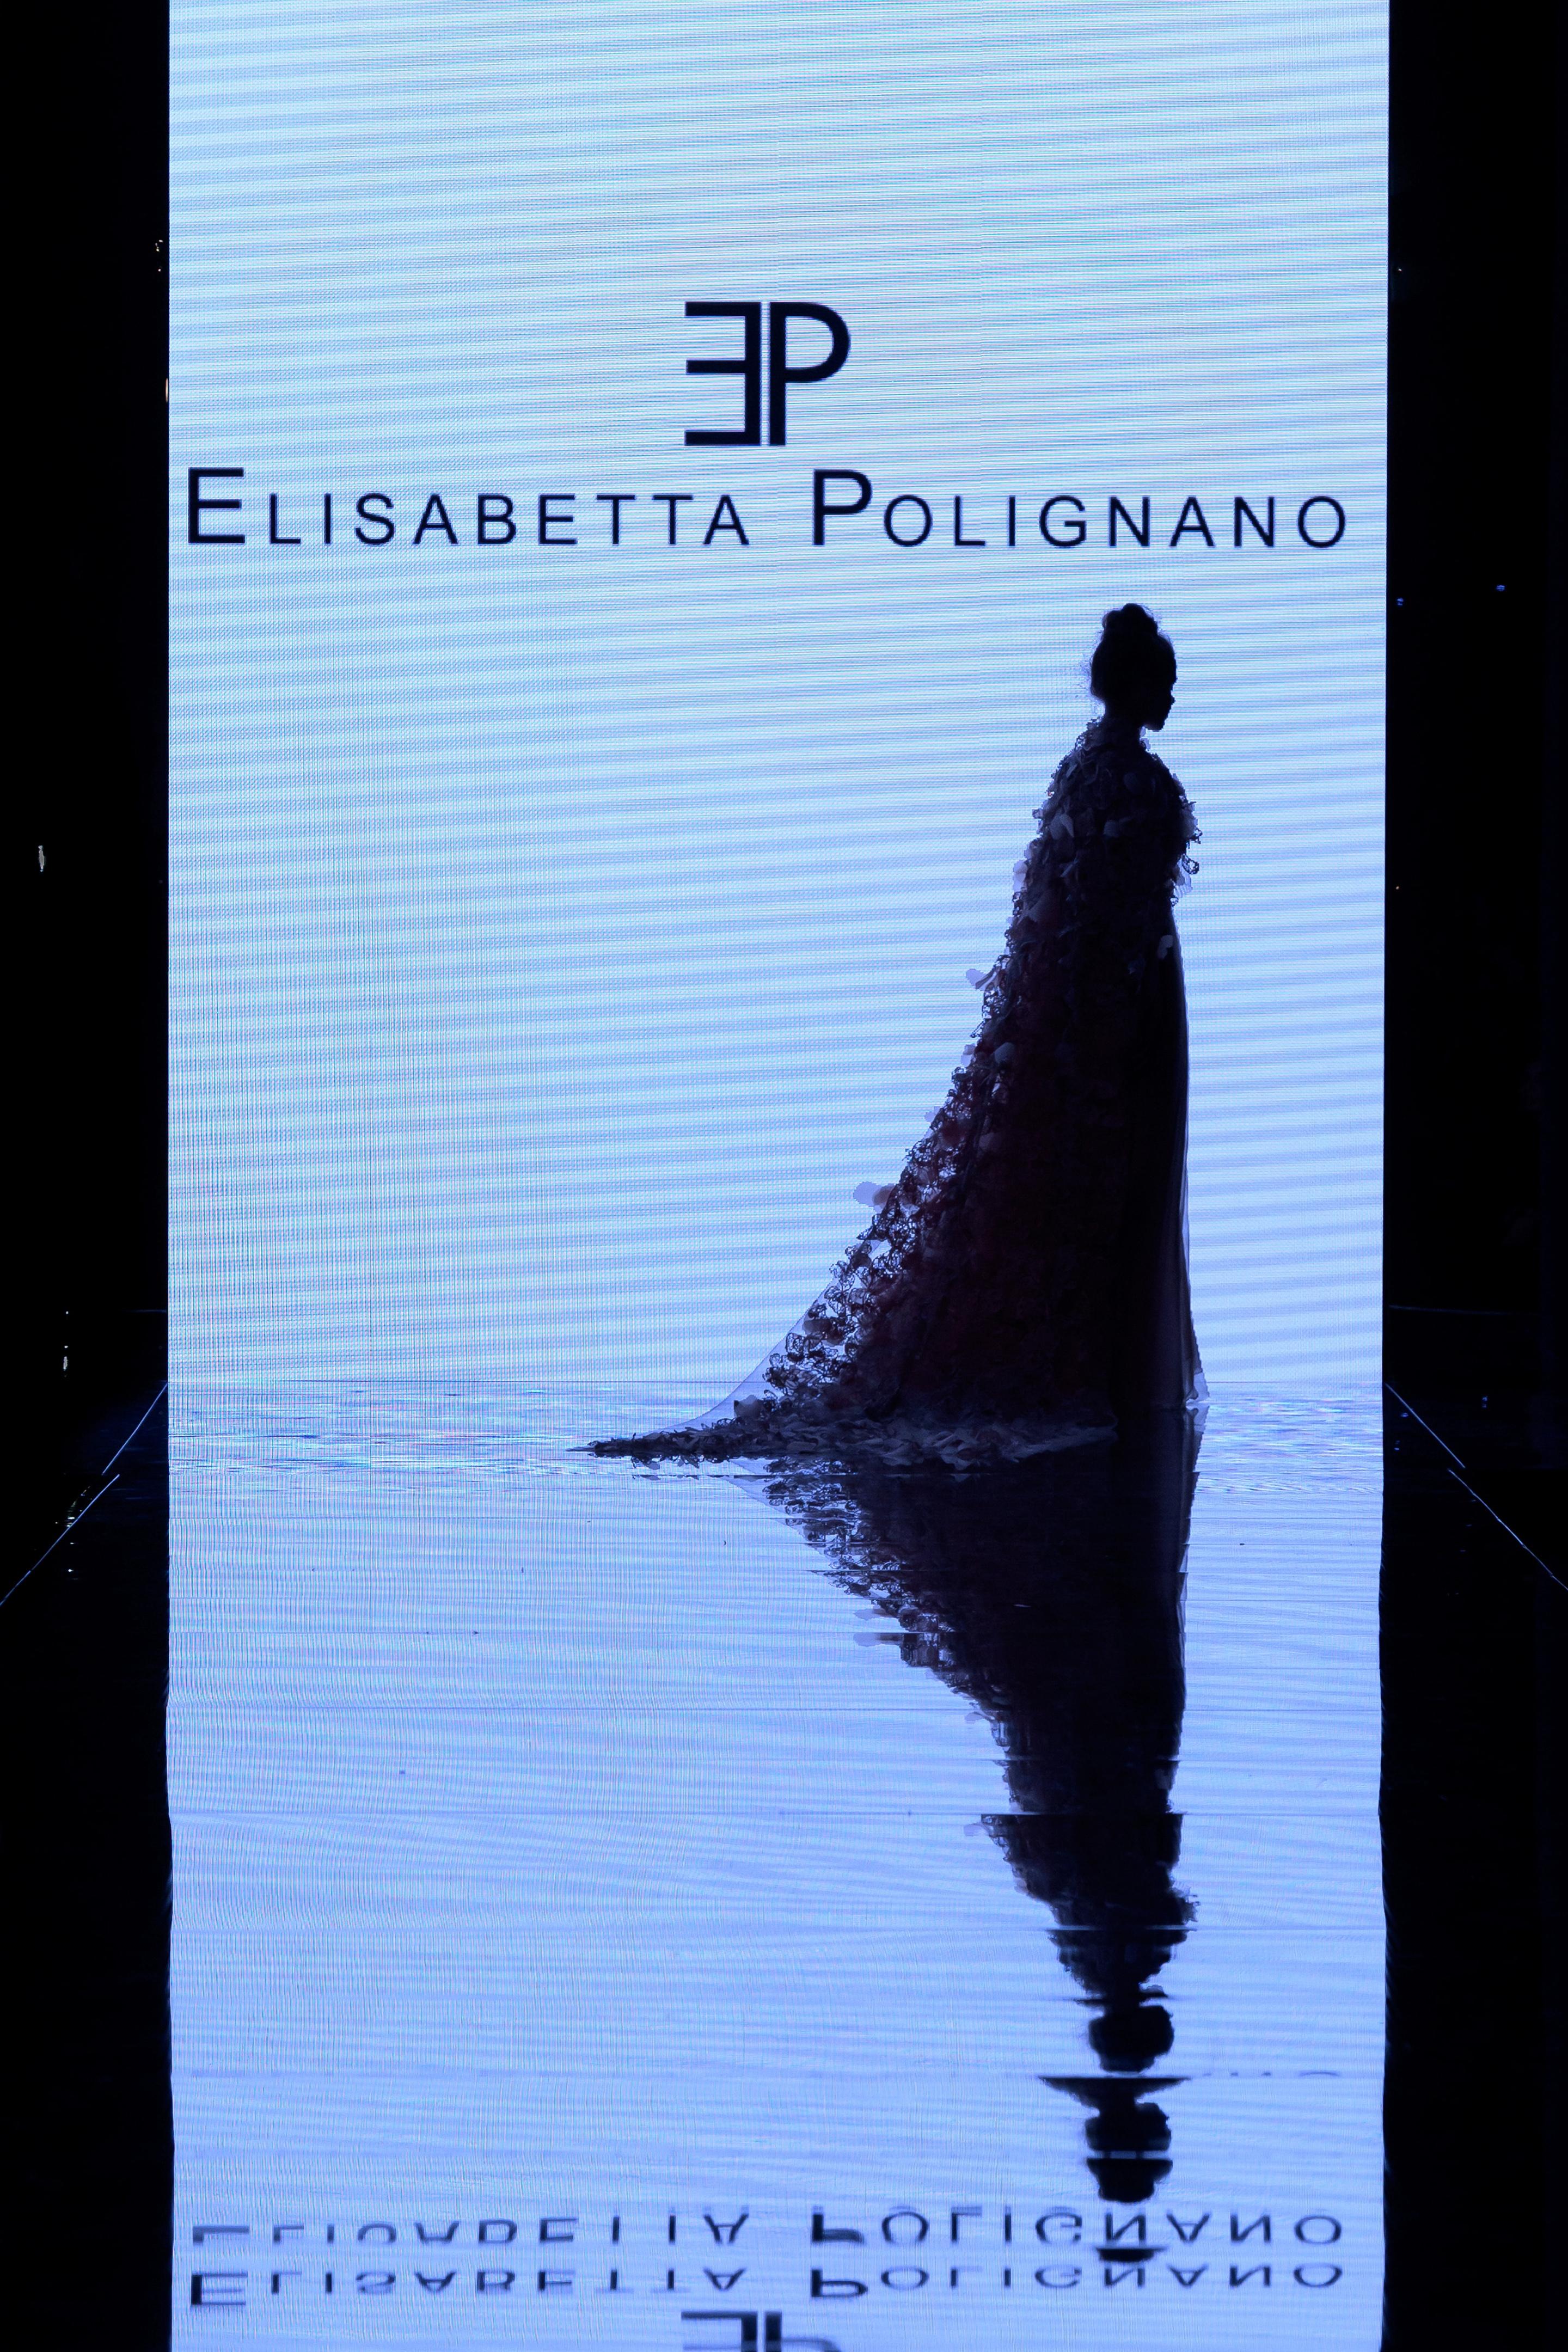 elisabetta-polignano-rs20-0767